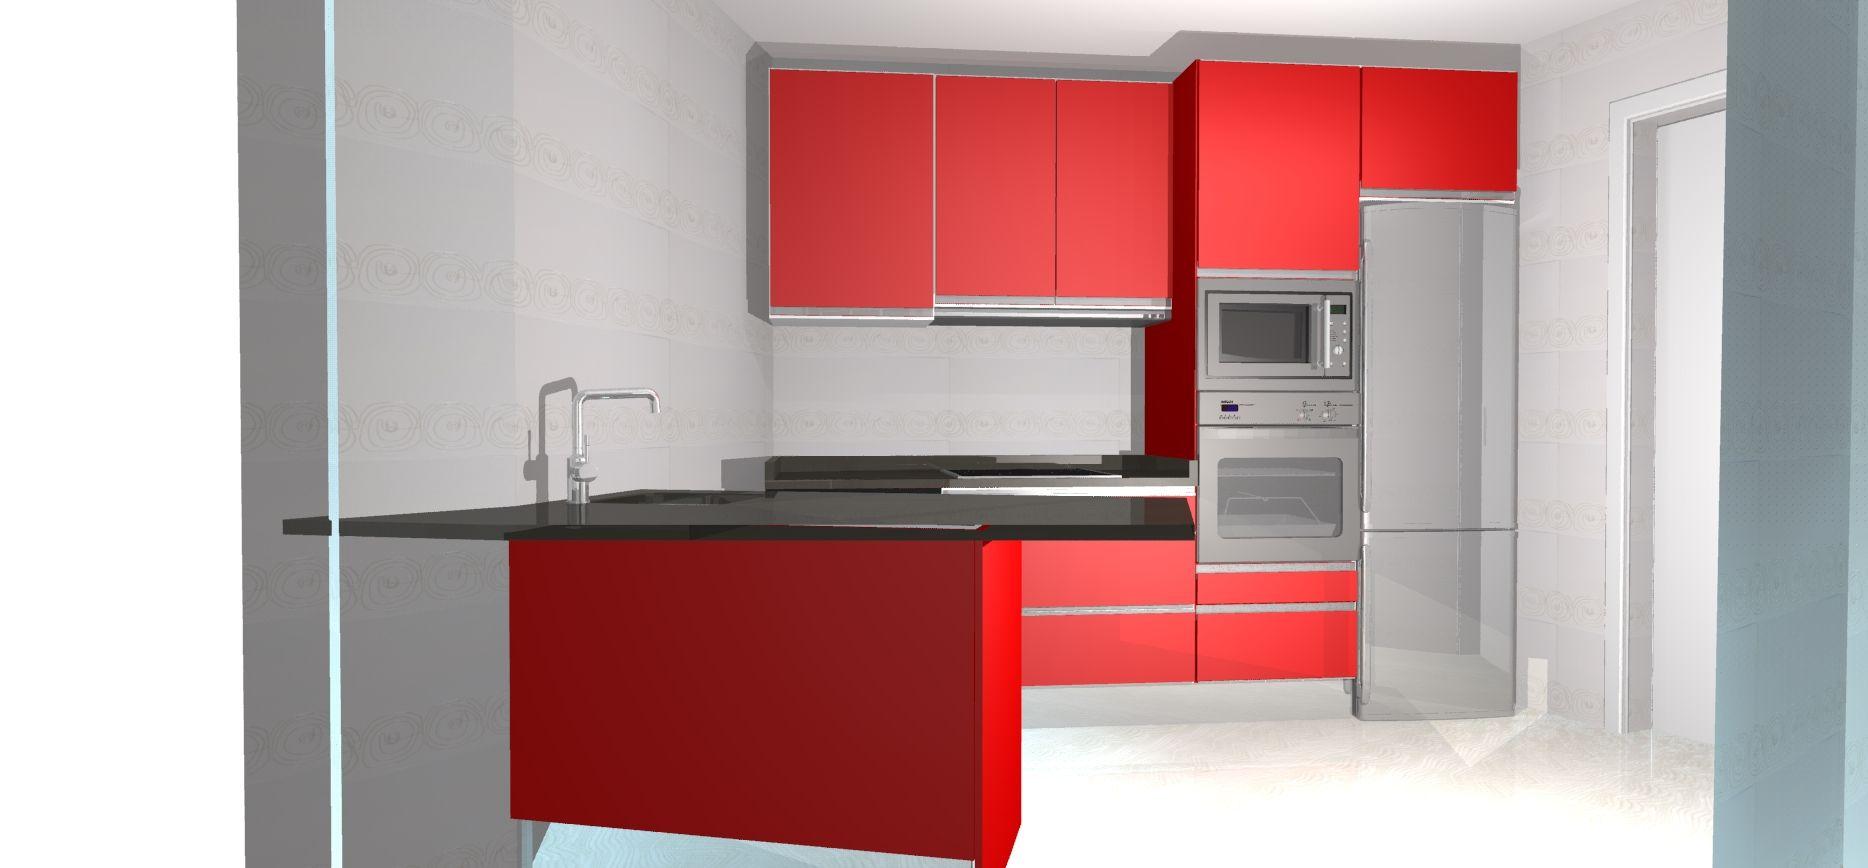 Fabricamos todo tipo de mobiliario de cocina a medida